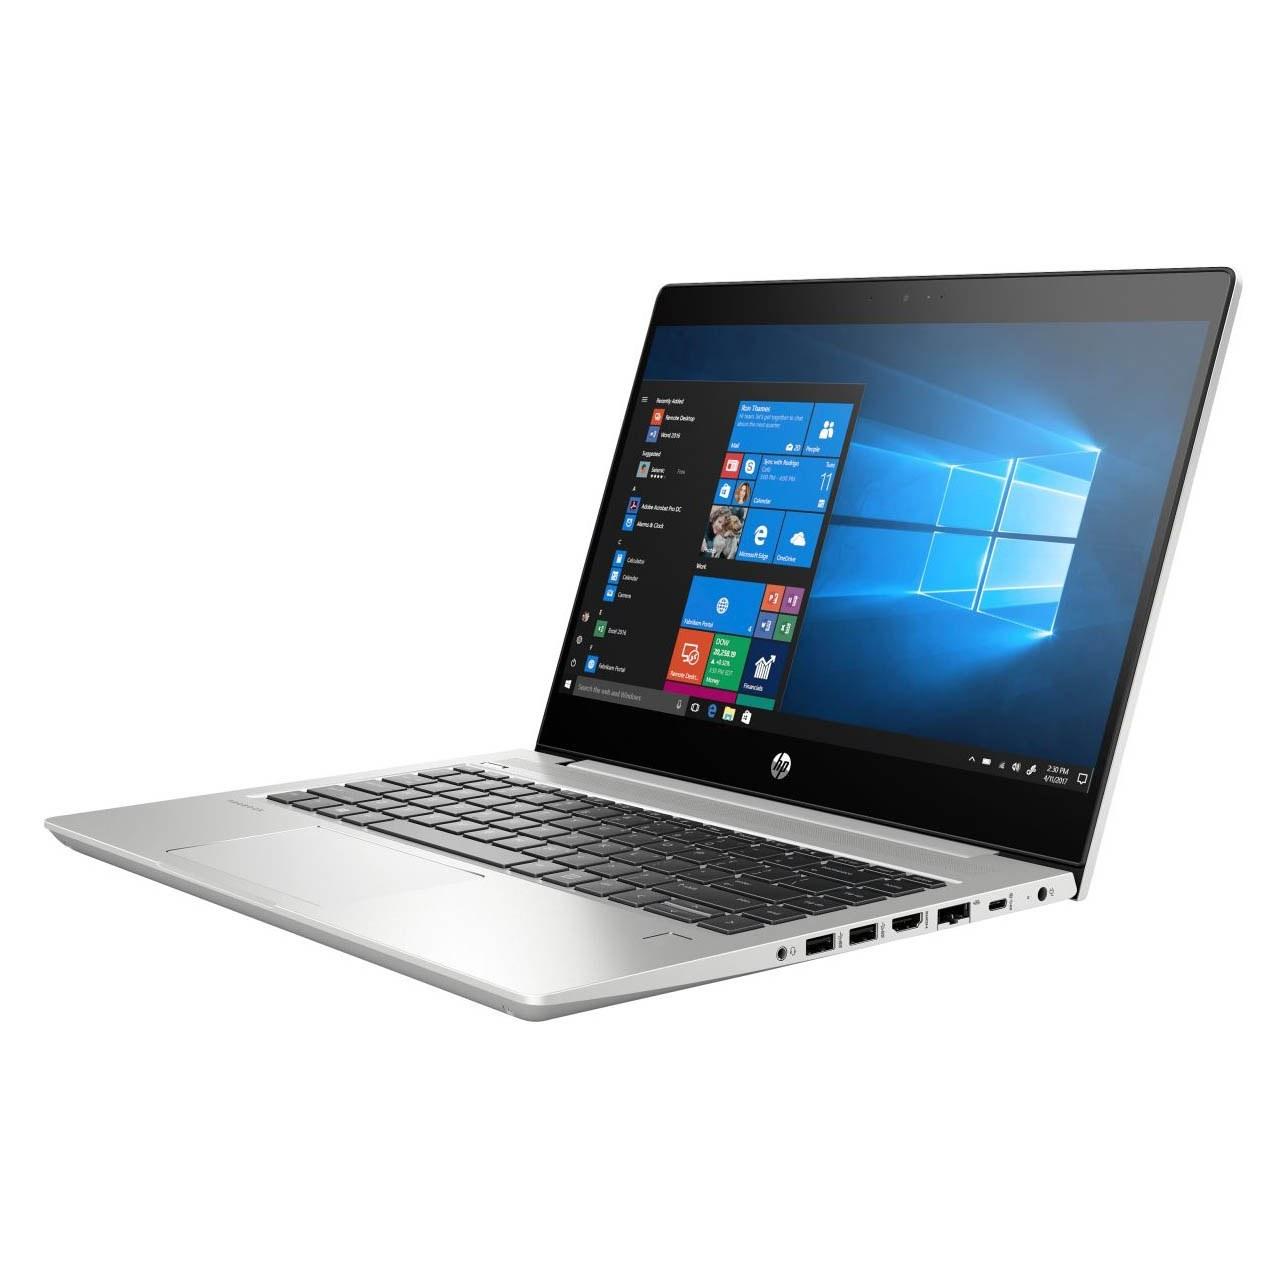 عکس لپ تاپ ریفربشد HP ProBook 445r G6 Ryzen 5  لپ-تاپ-ریفربشد-hp-probook-445r-g6-ryzen-5